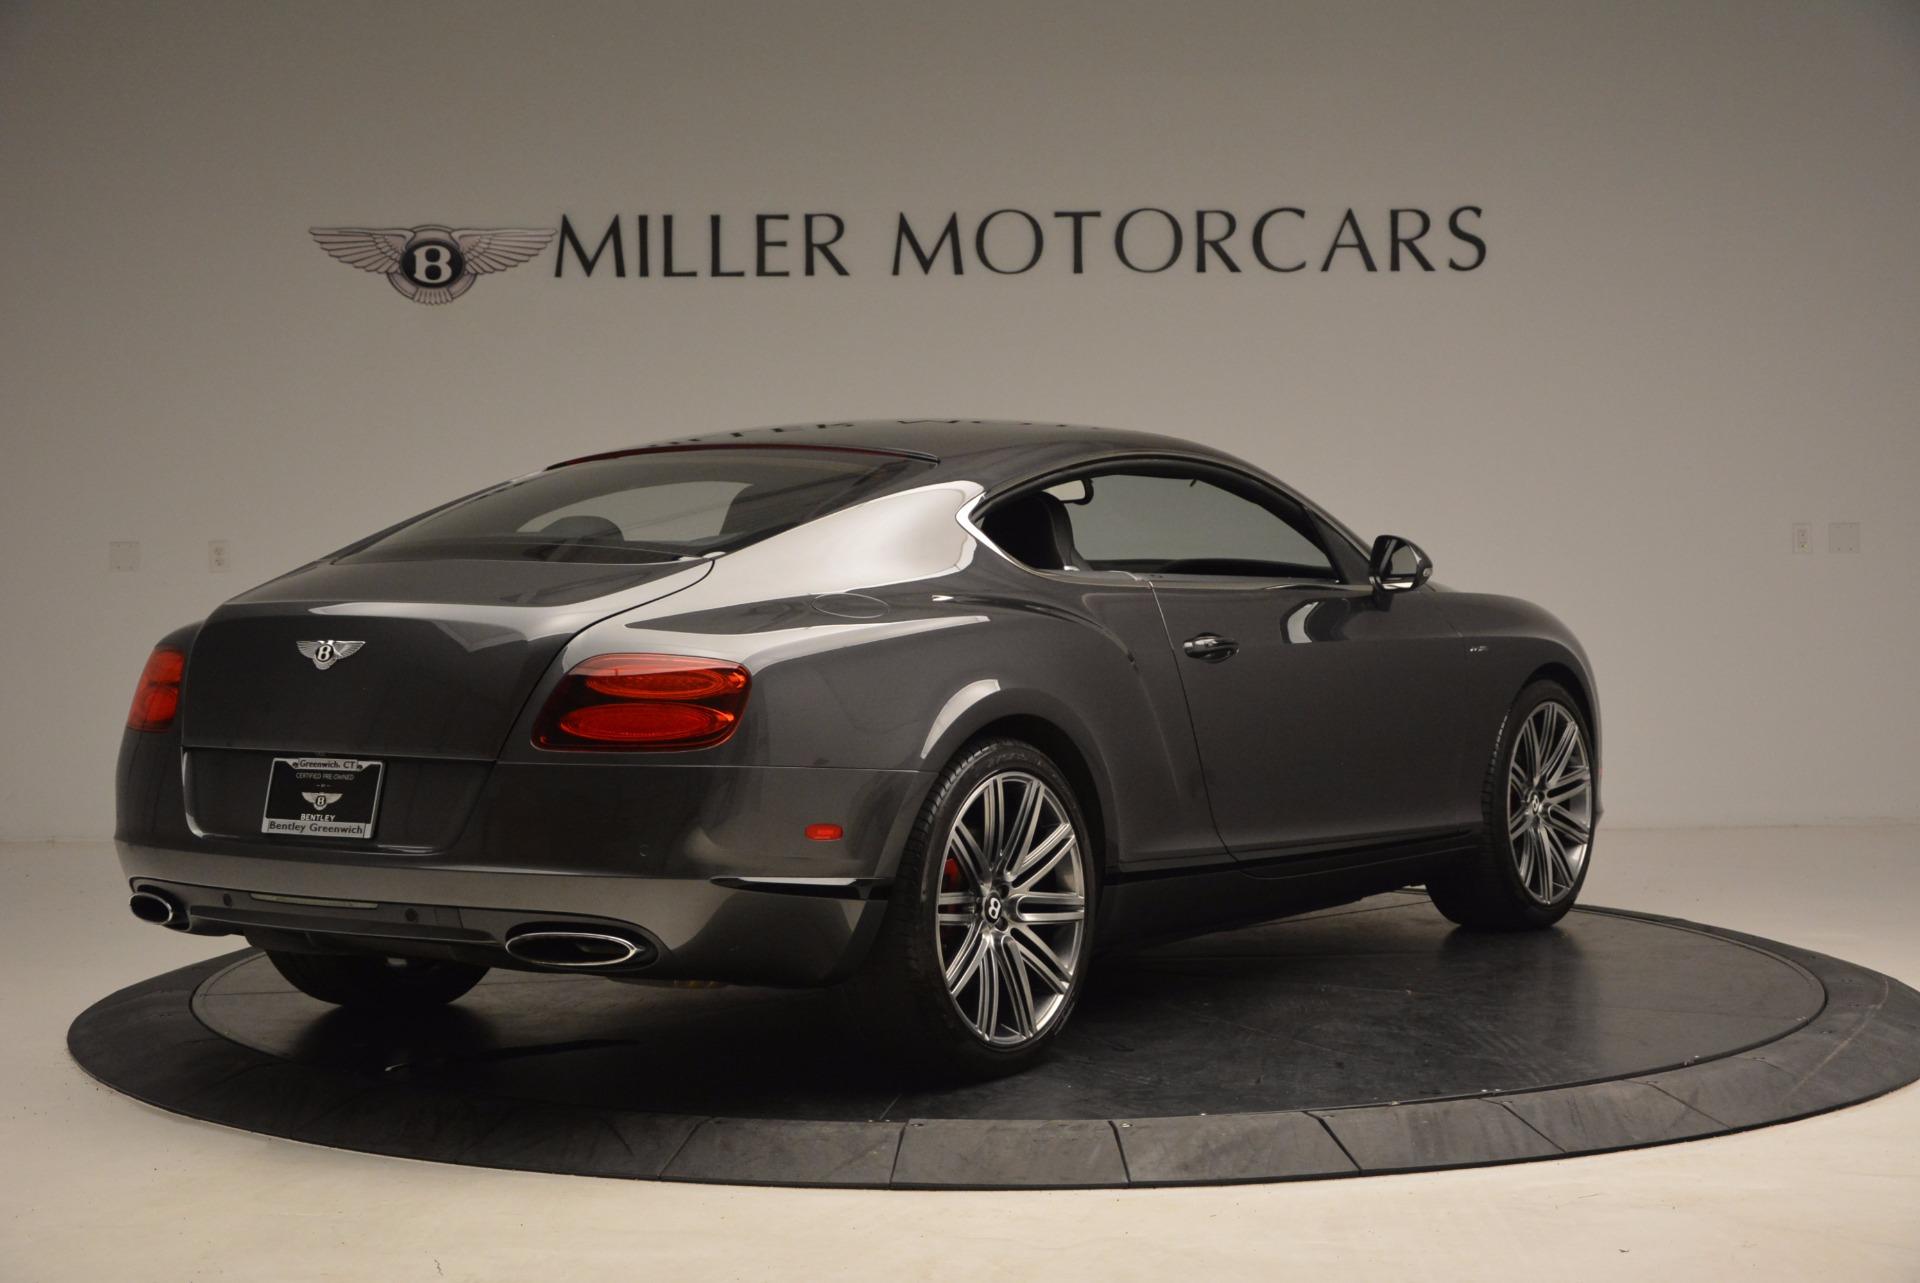 Used 2014 Bentley Continental GT Speed For Sale In Westport, CT 1473_p8